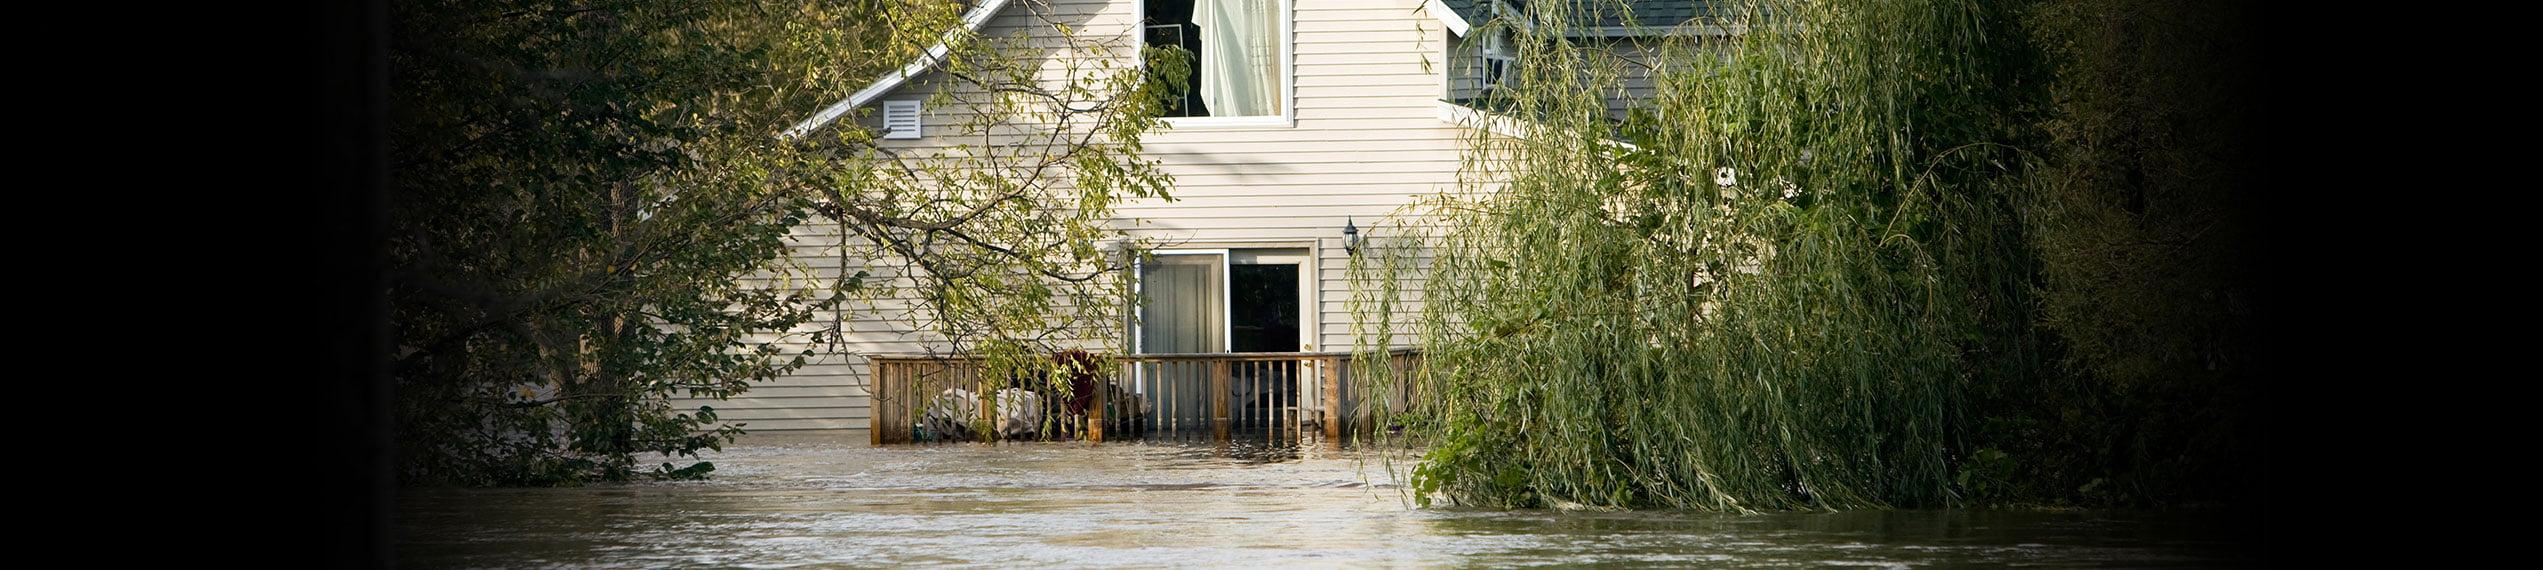 Water & Flood Damage Removal Services in Paul Davis Restoration & Remodeling of Elizabethtown